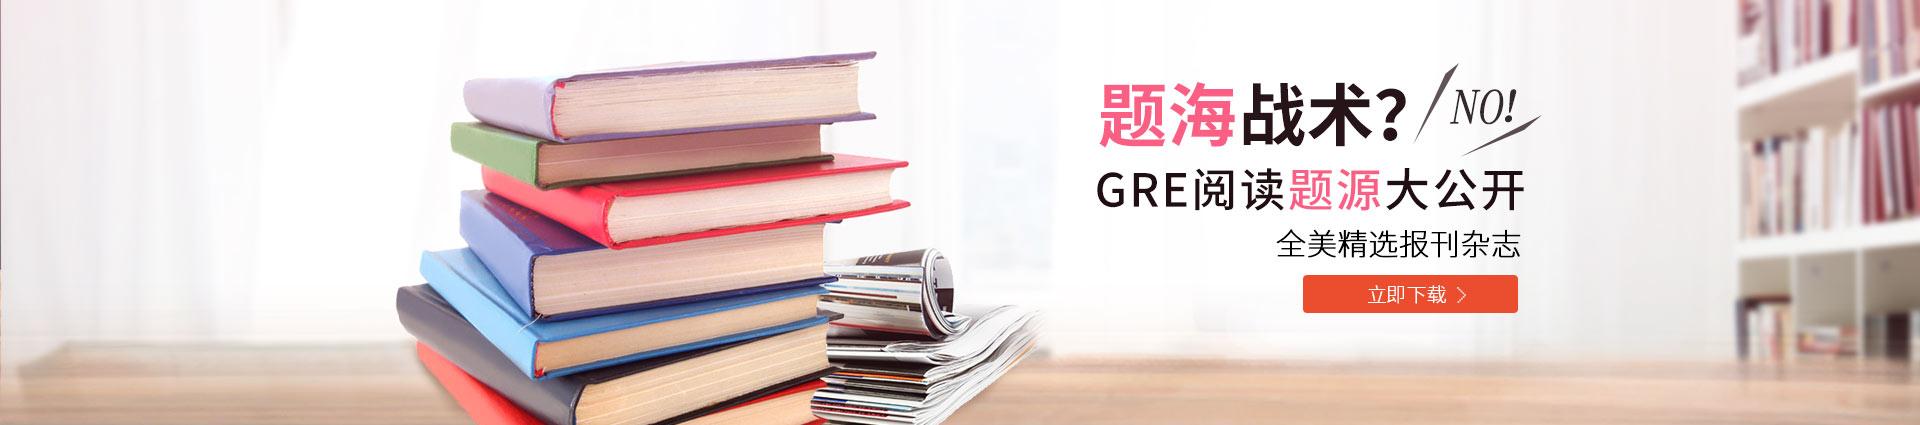 GRE阅读题源大公开